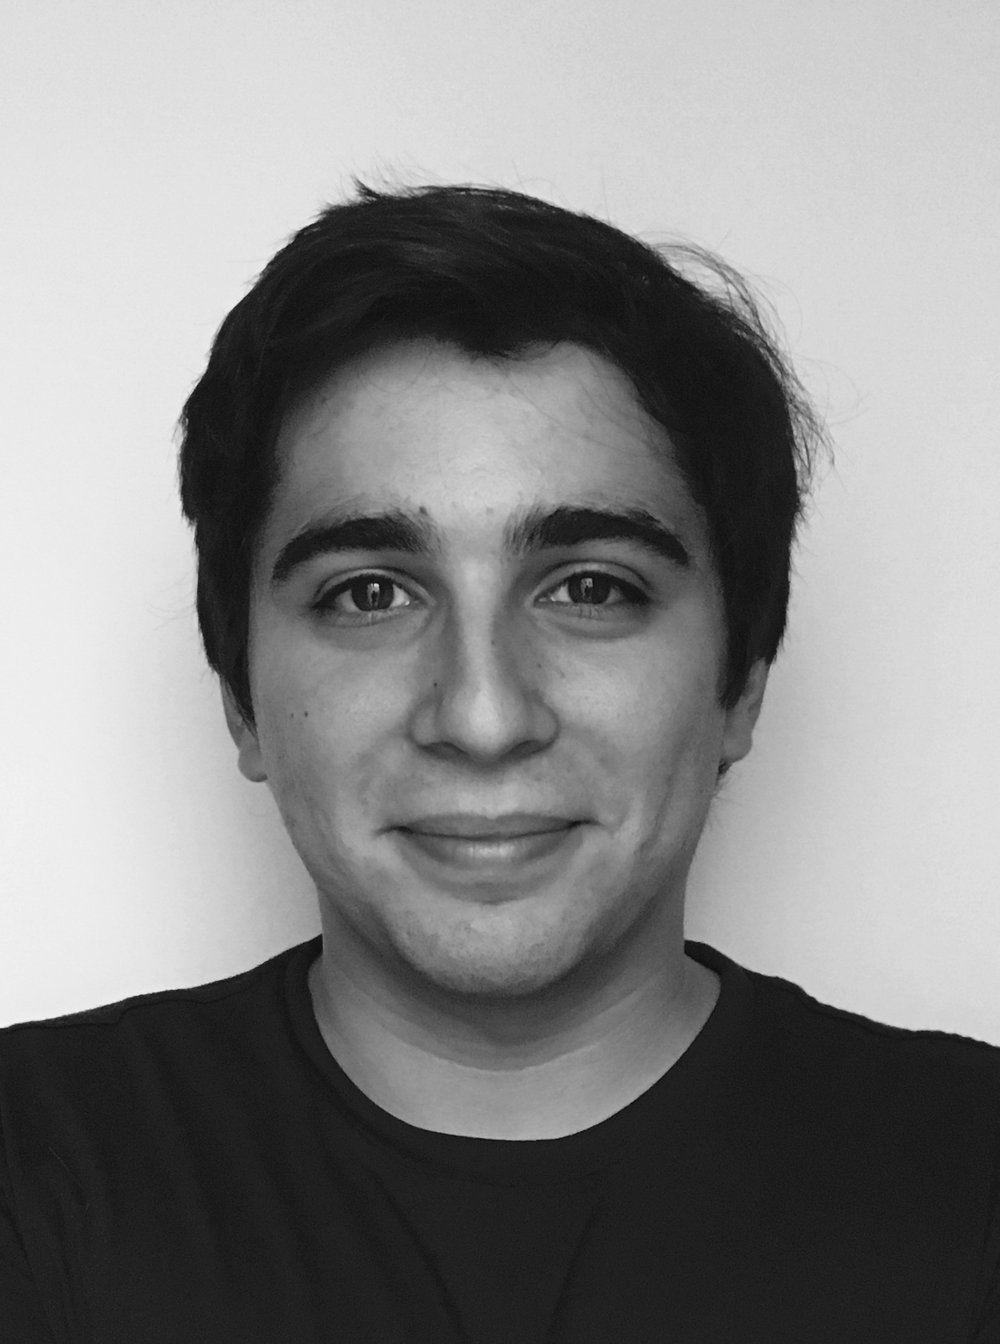 Corporate   Ethan Martinez  Responsable de Innovación Abierta en  Global Omnium  + Director de  Sic Parvis Magna